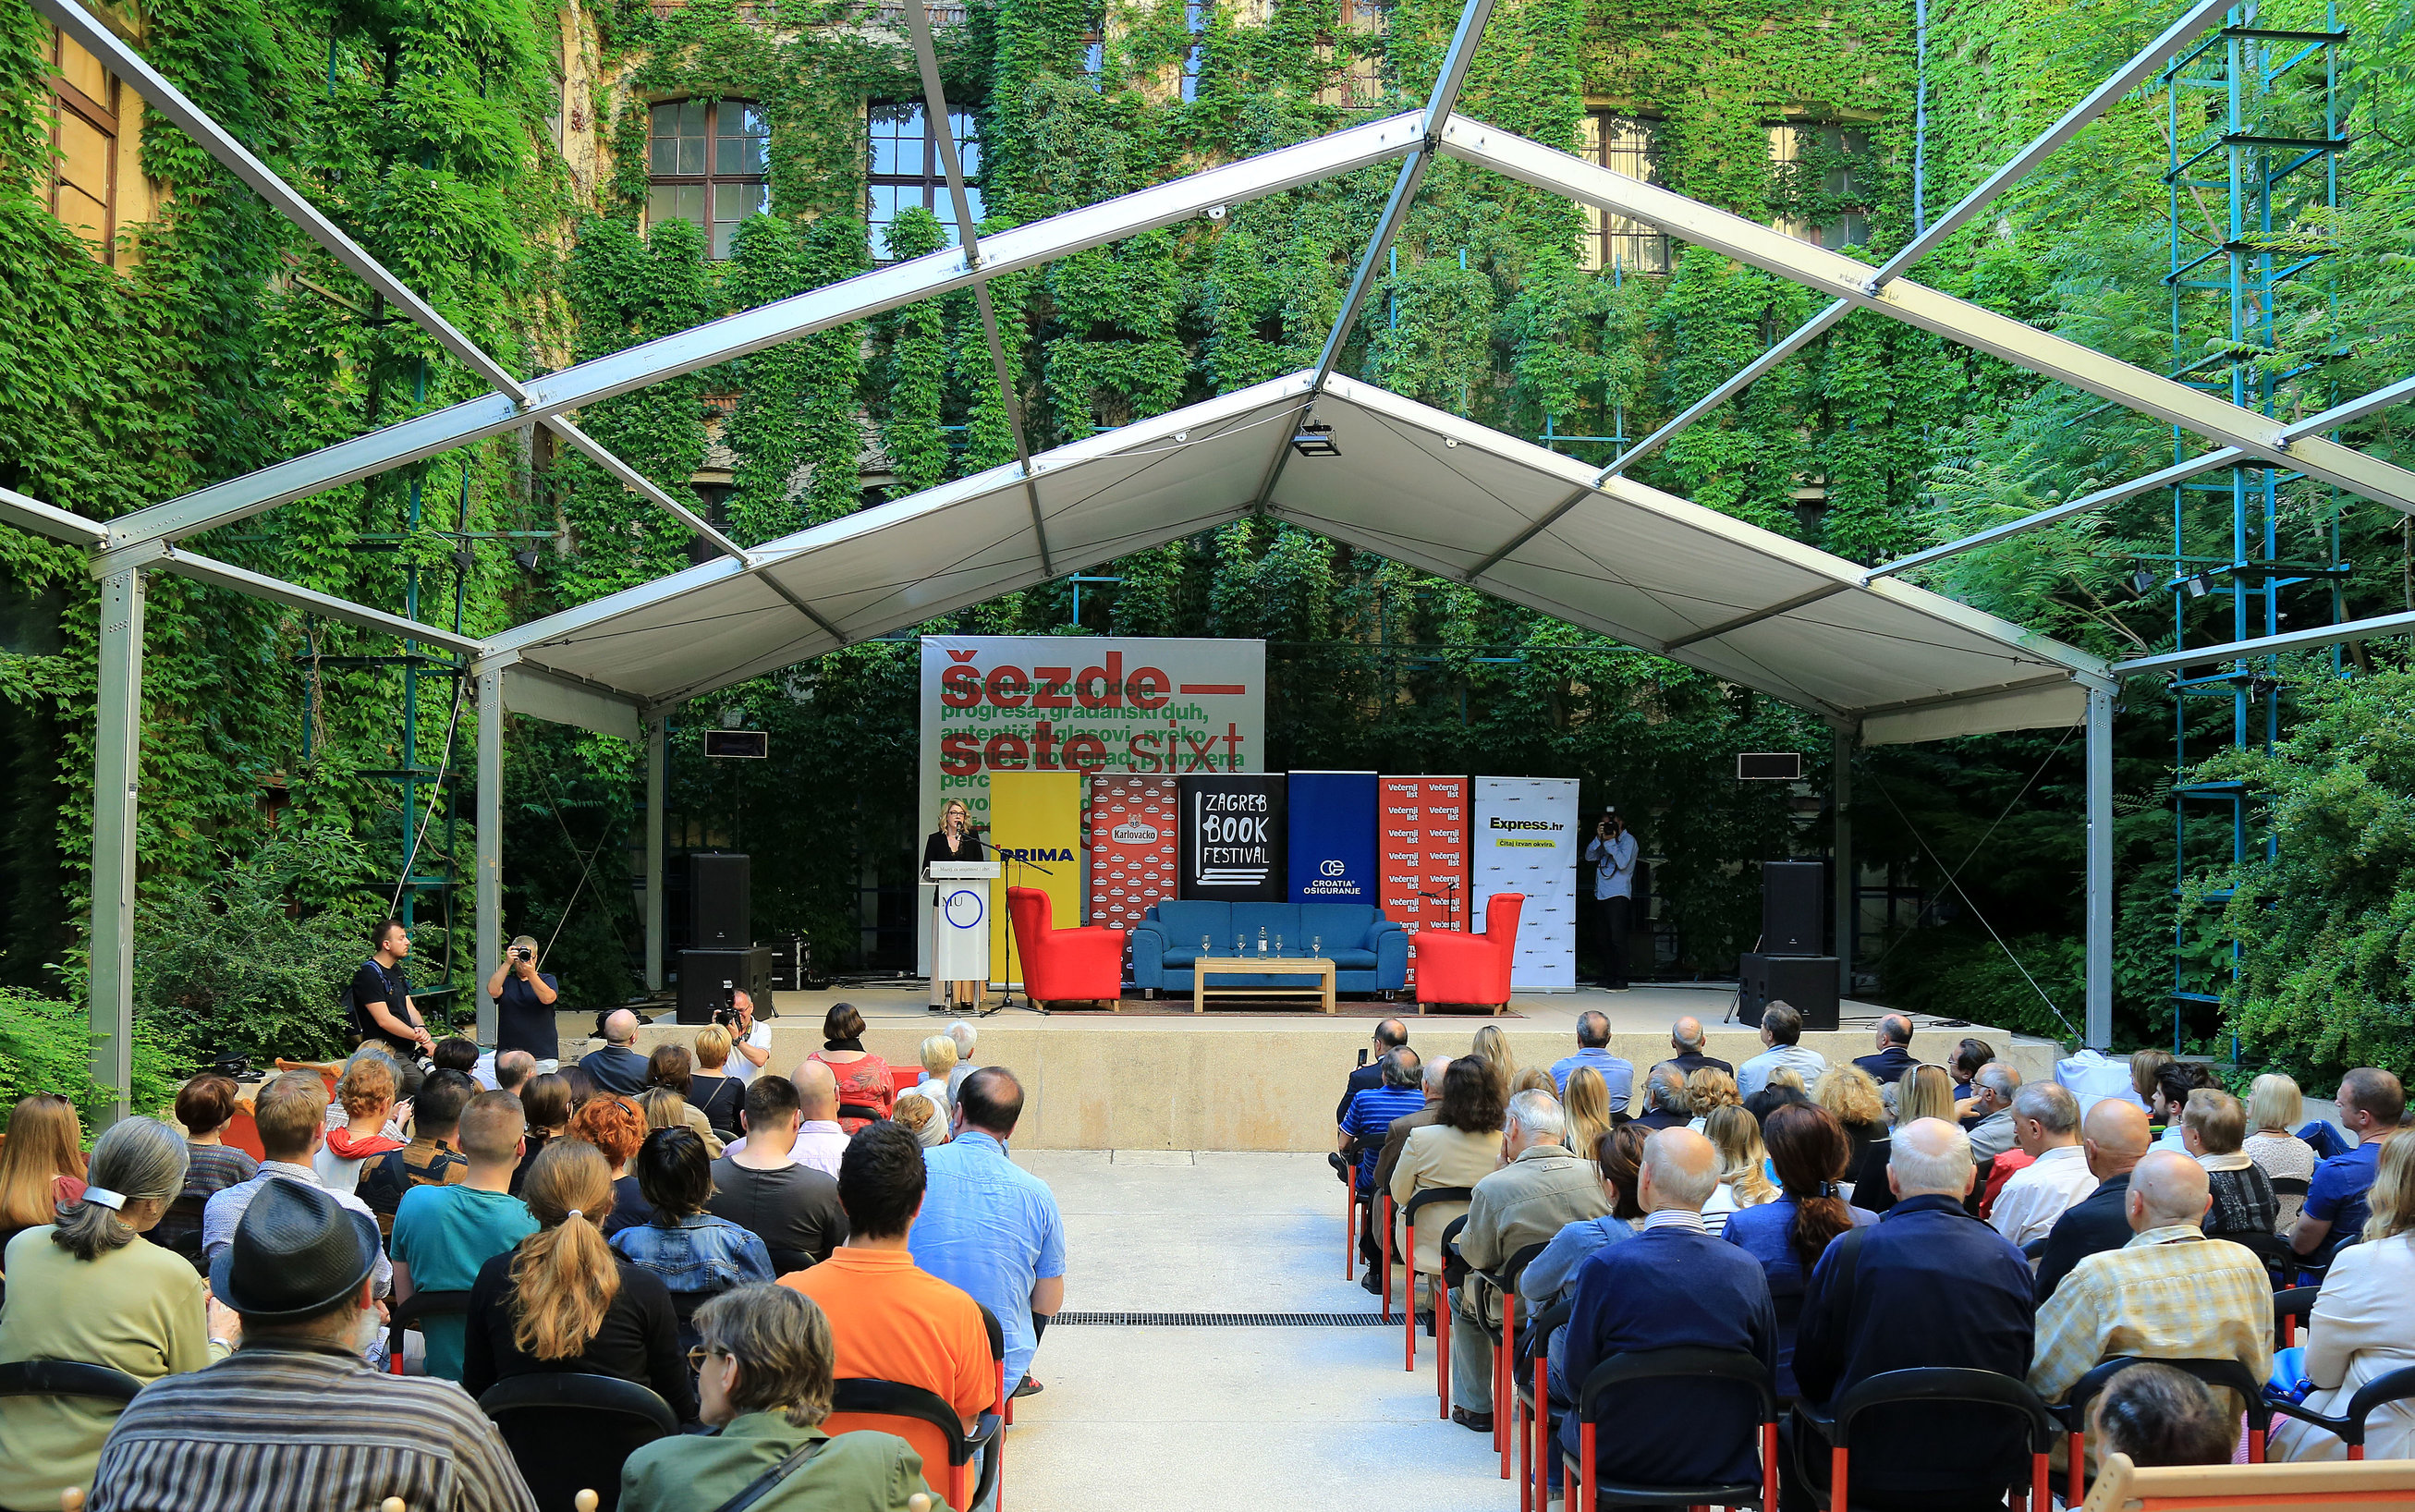 Otvoren 4. Zagreb Book Festival